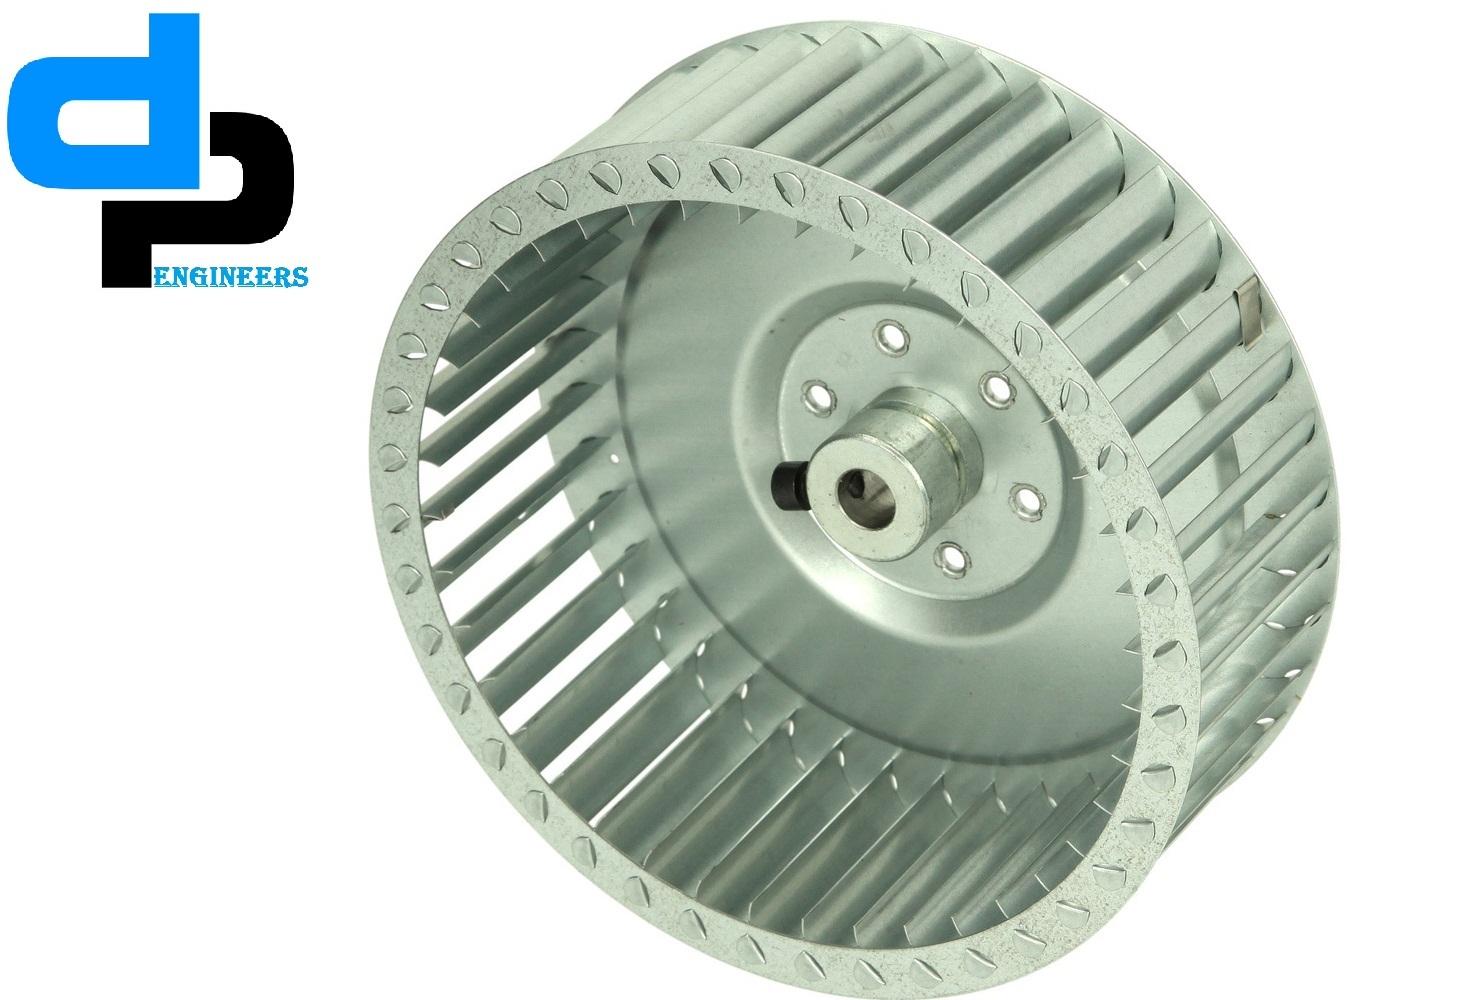 SISW Centrifugal Blower 330 MM X 150 MM